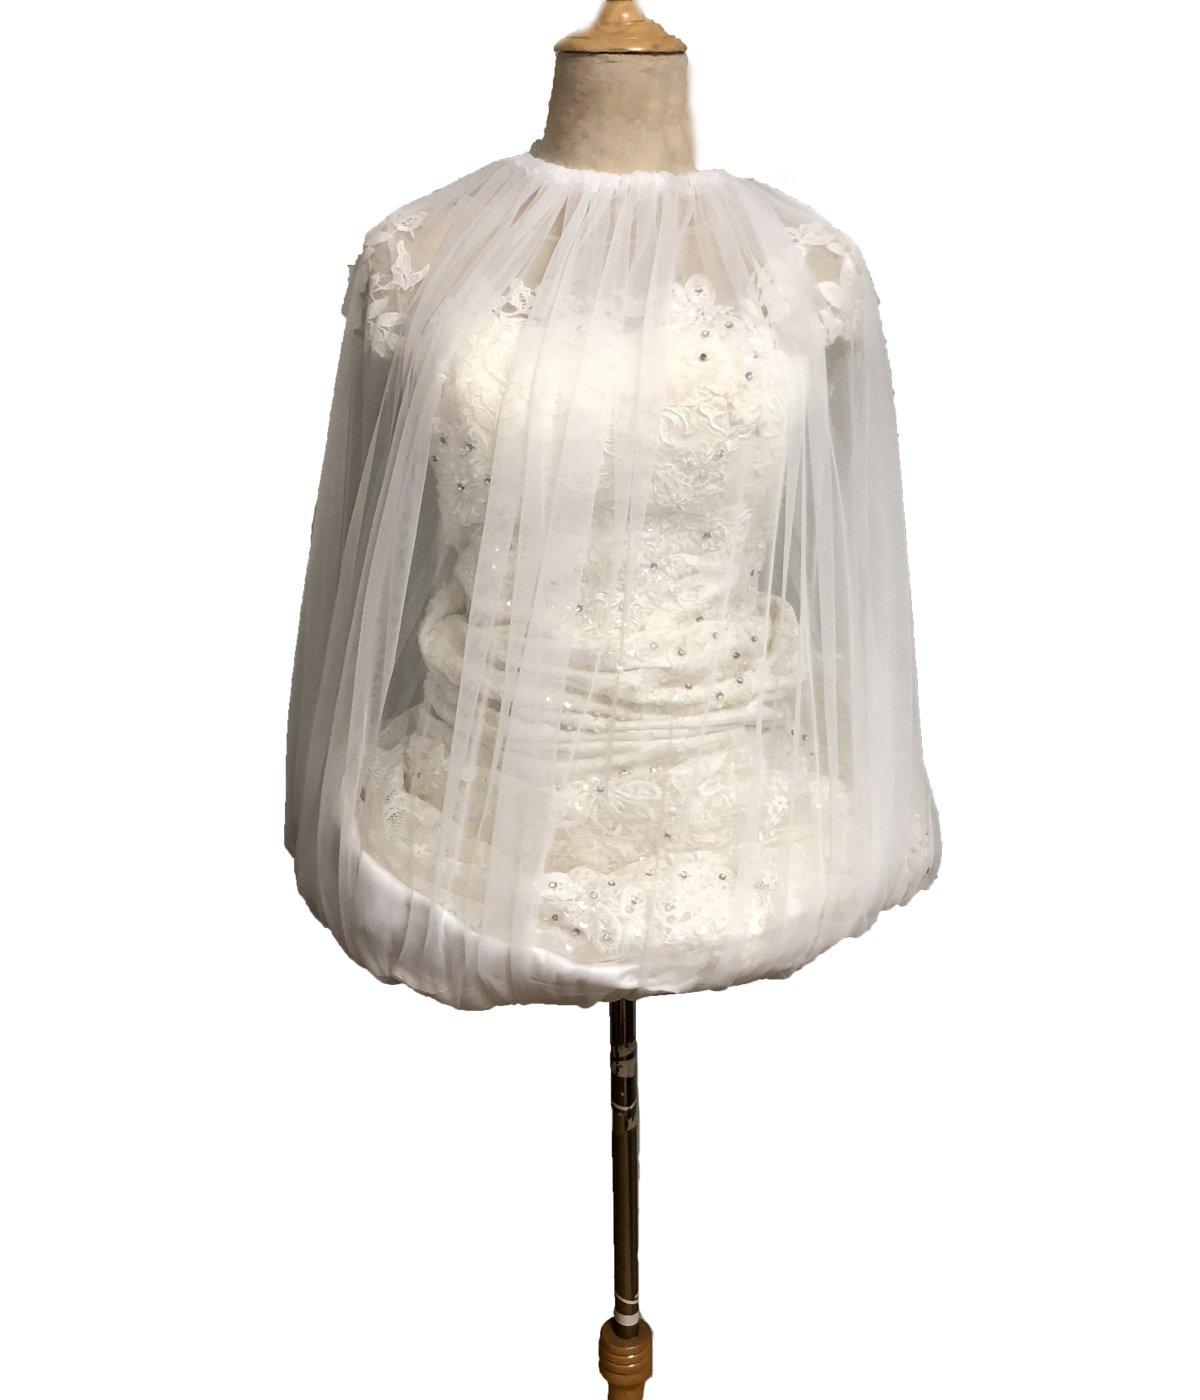 JQLD in Stock Bridal Petticoat Gather Skirt Slip Toilet Petticoat Save Wedding Dress from Toilet Water White M